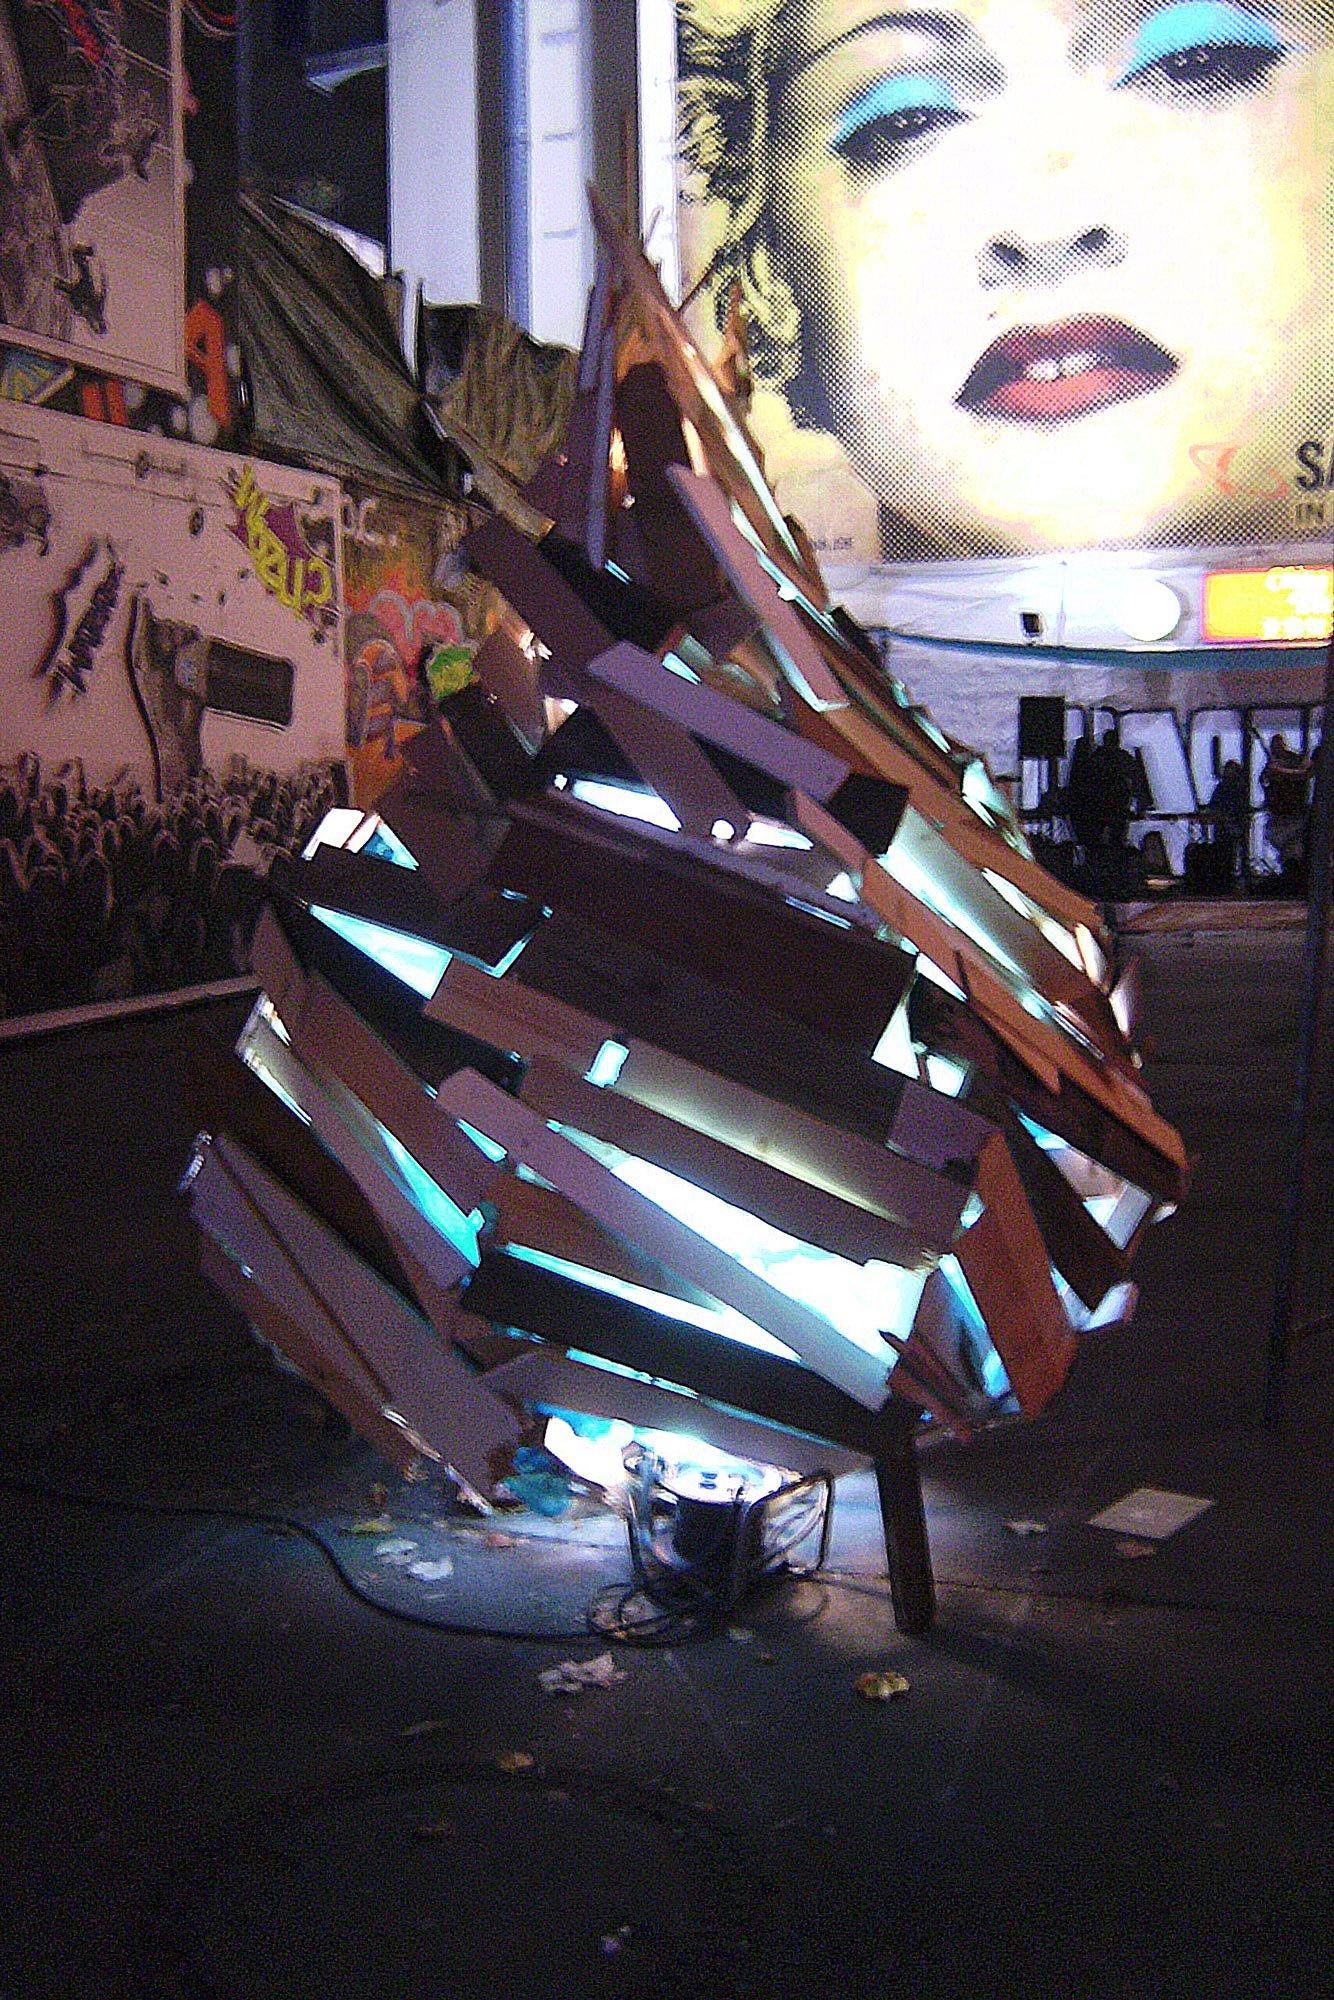 Reeperbahnfestival 2009: Kunst